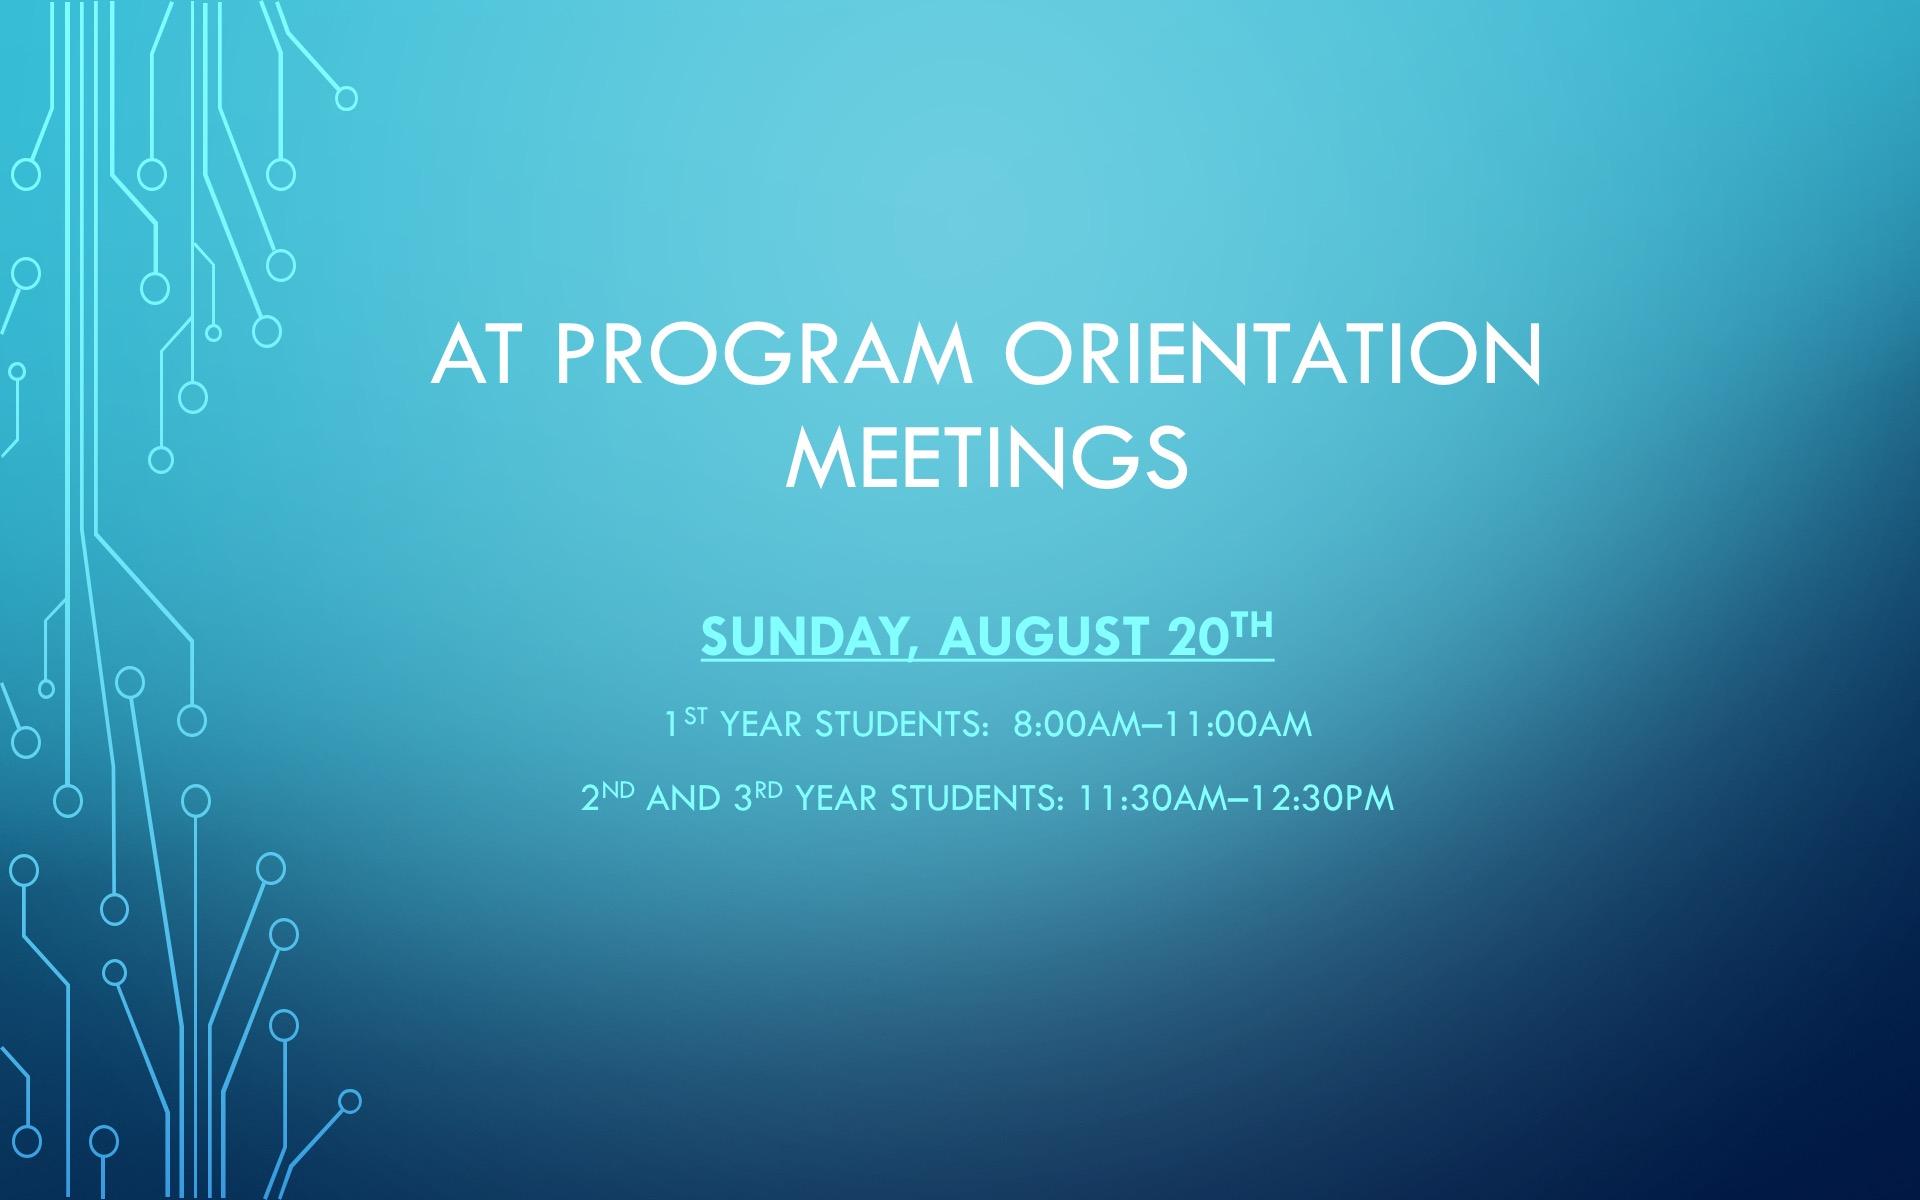 AT Program Orientation Meeting